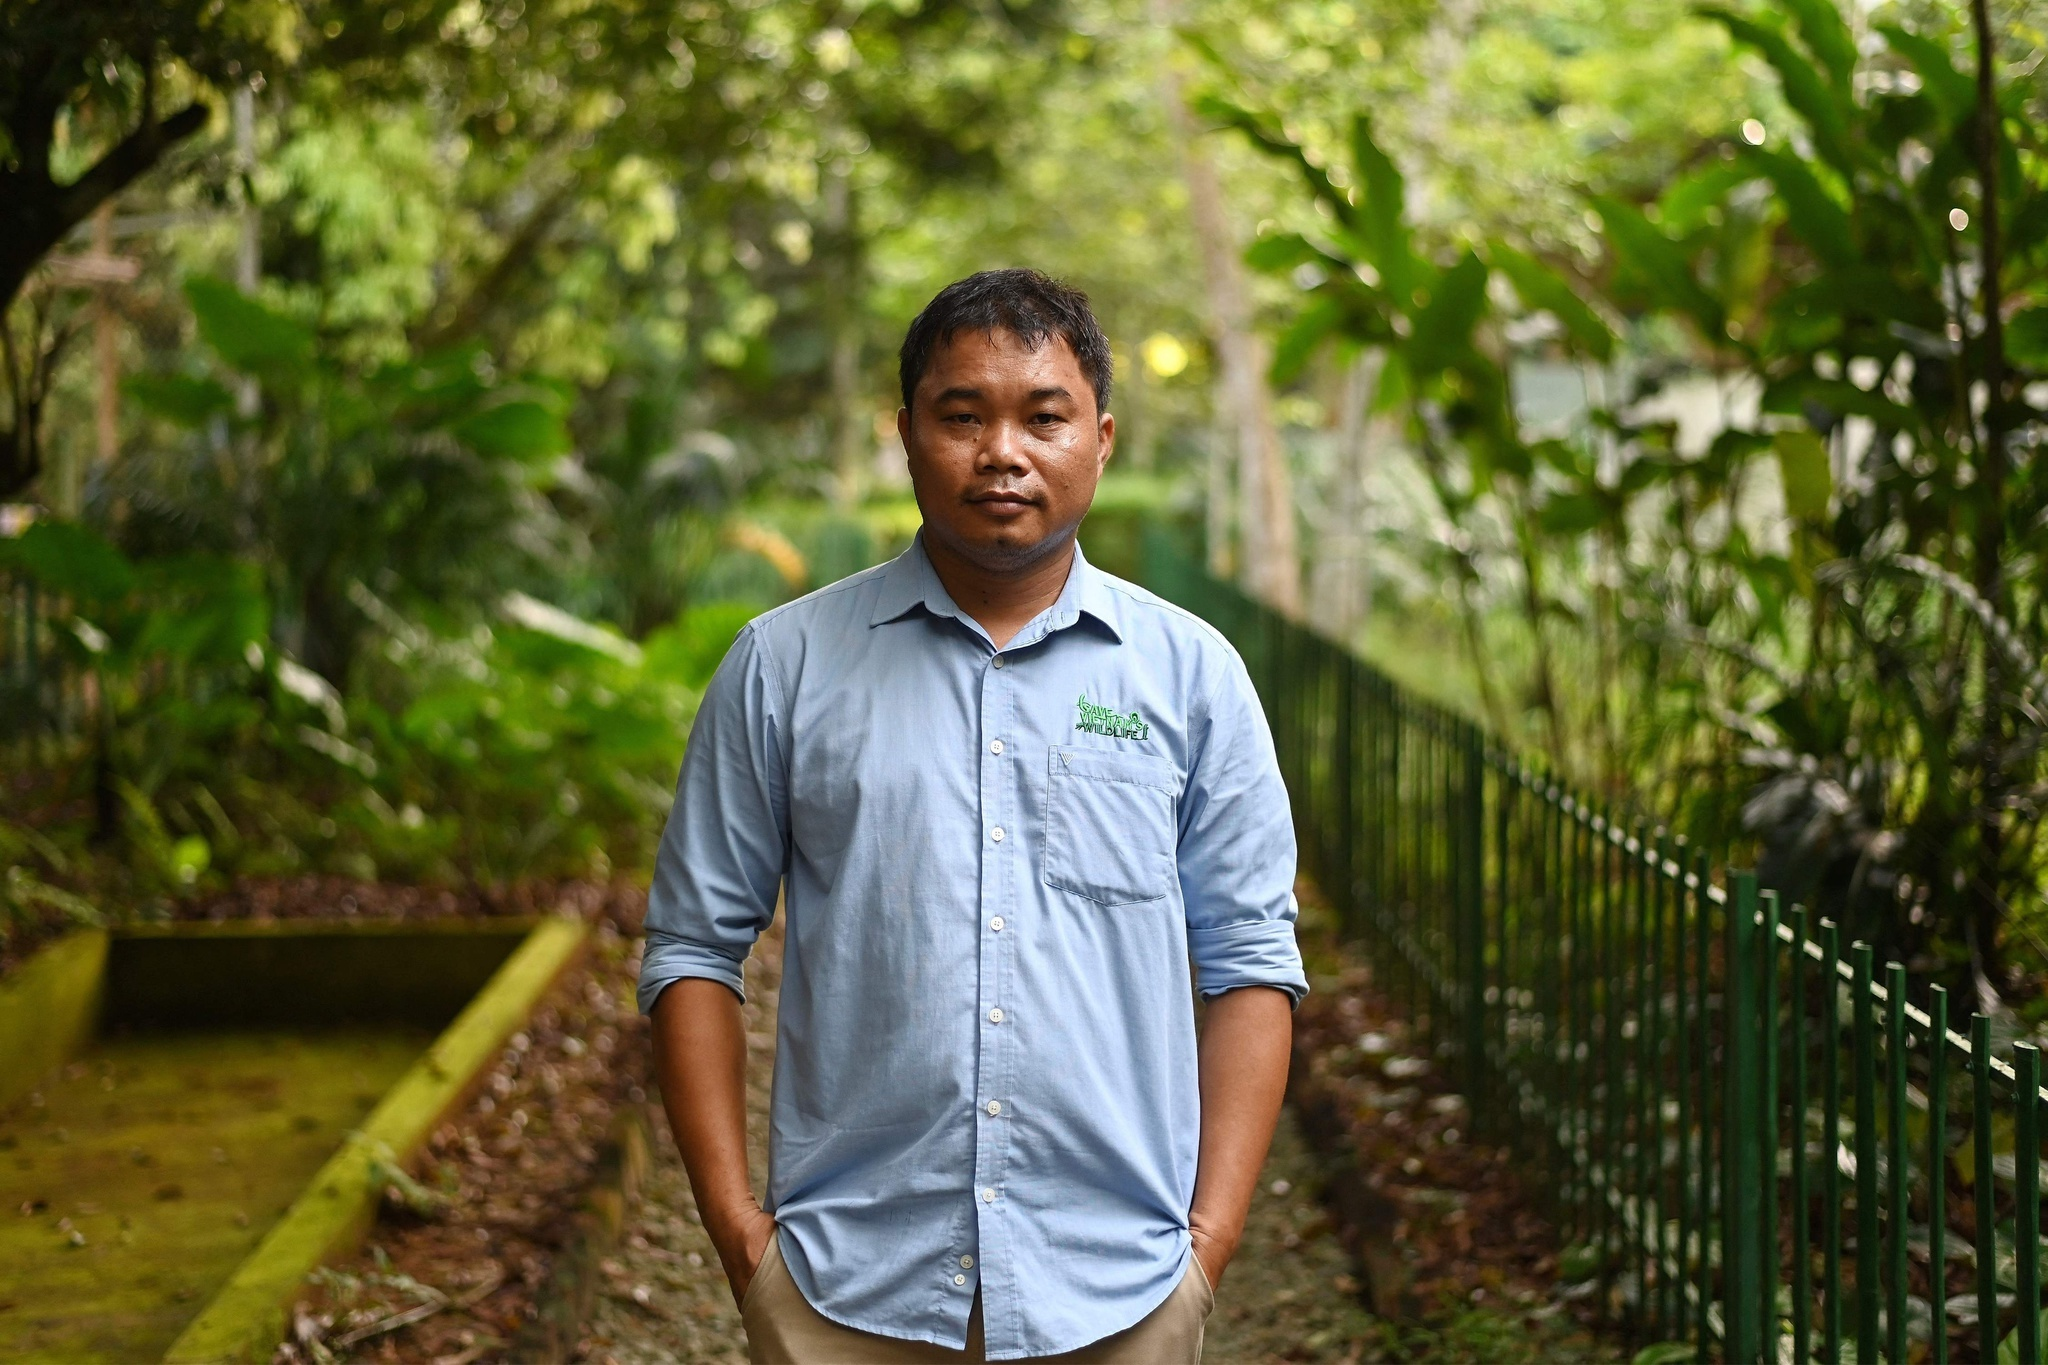 Vietnamese wildlife conservationist gets 'Green Nobel' prize